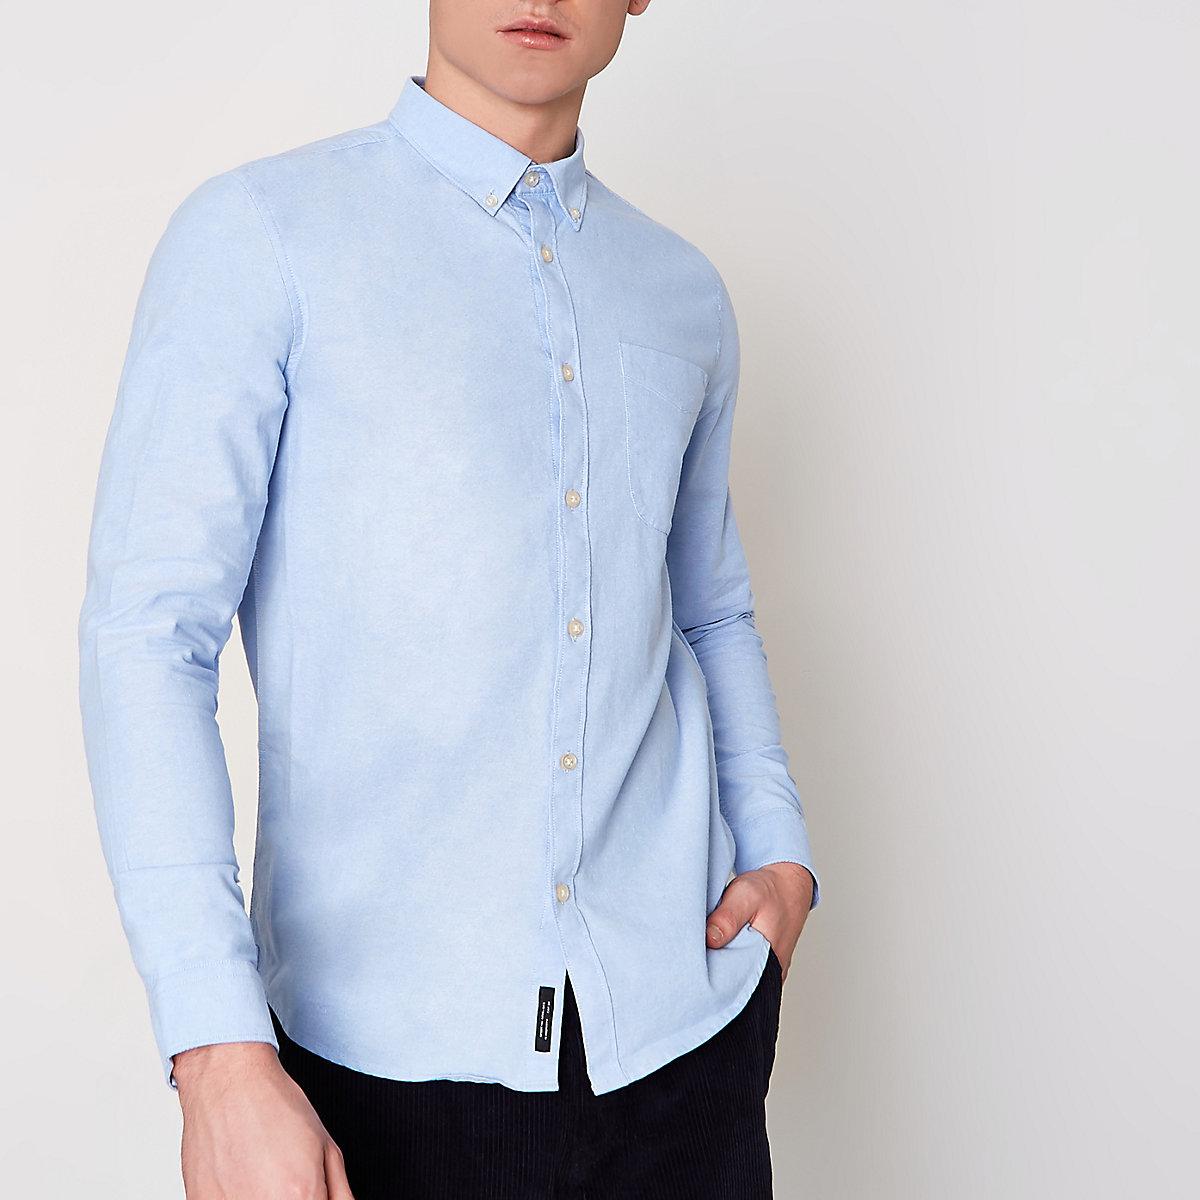 Light Blue Long Sleeve Oxford Shirt Long Sleeve Shirts Shirts Men